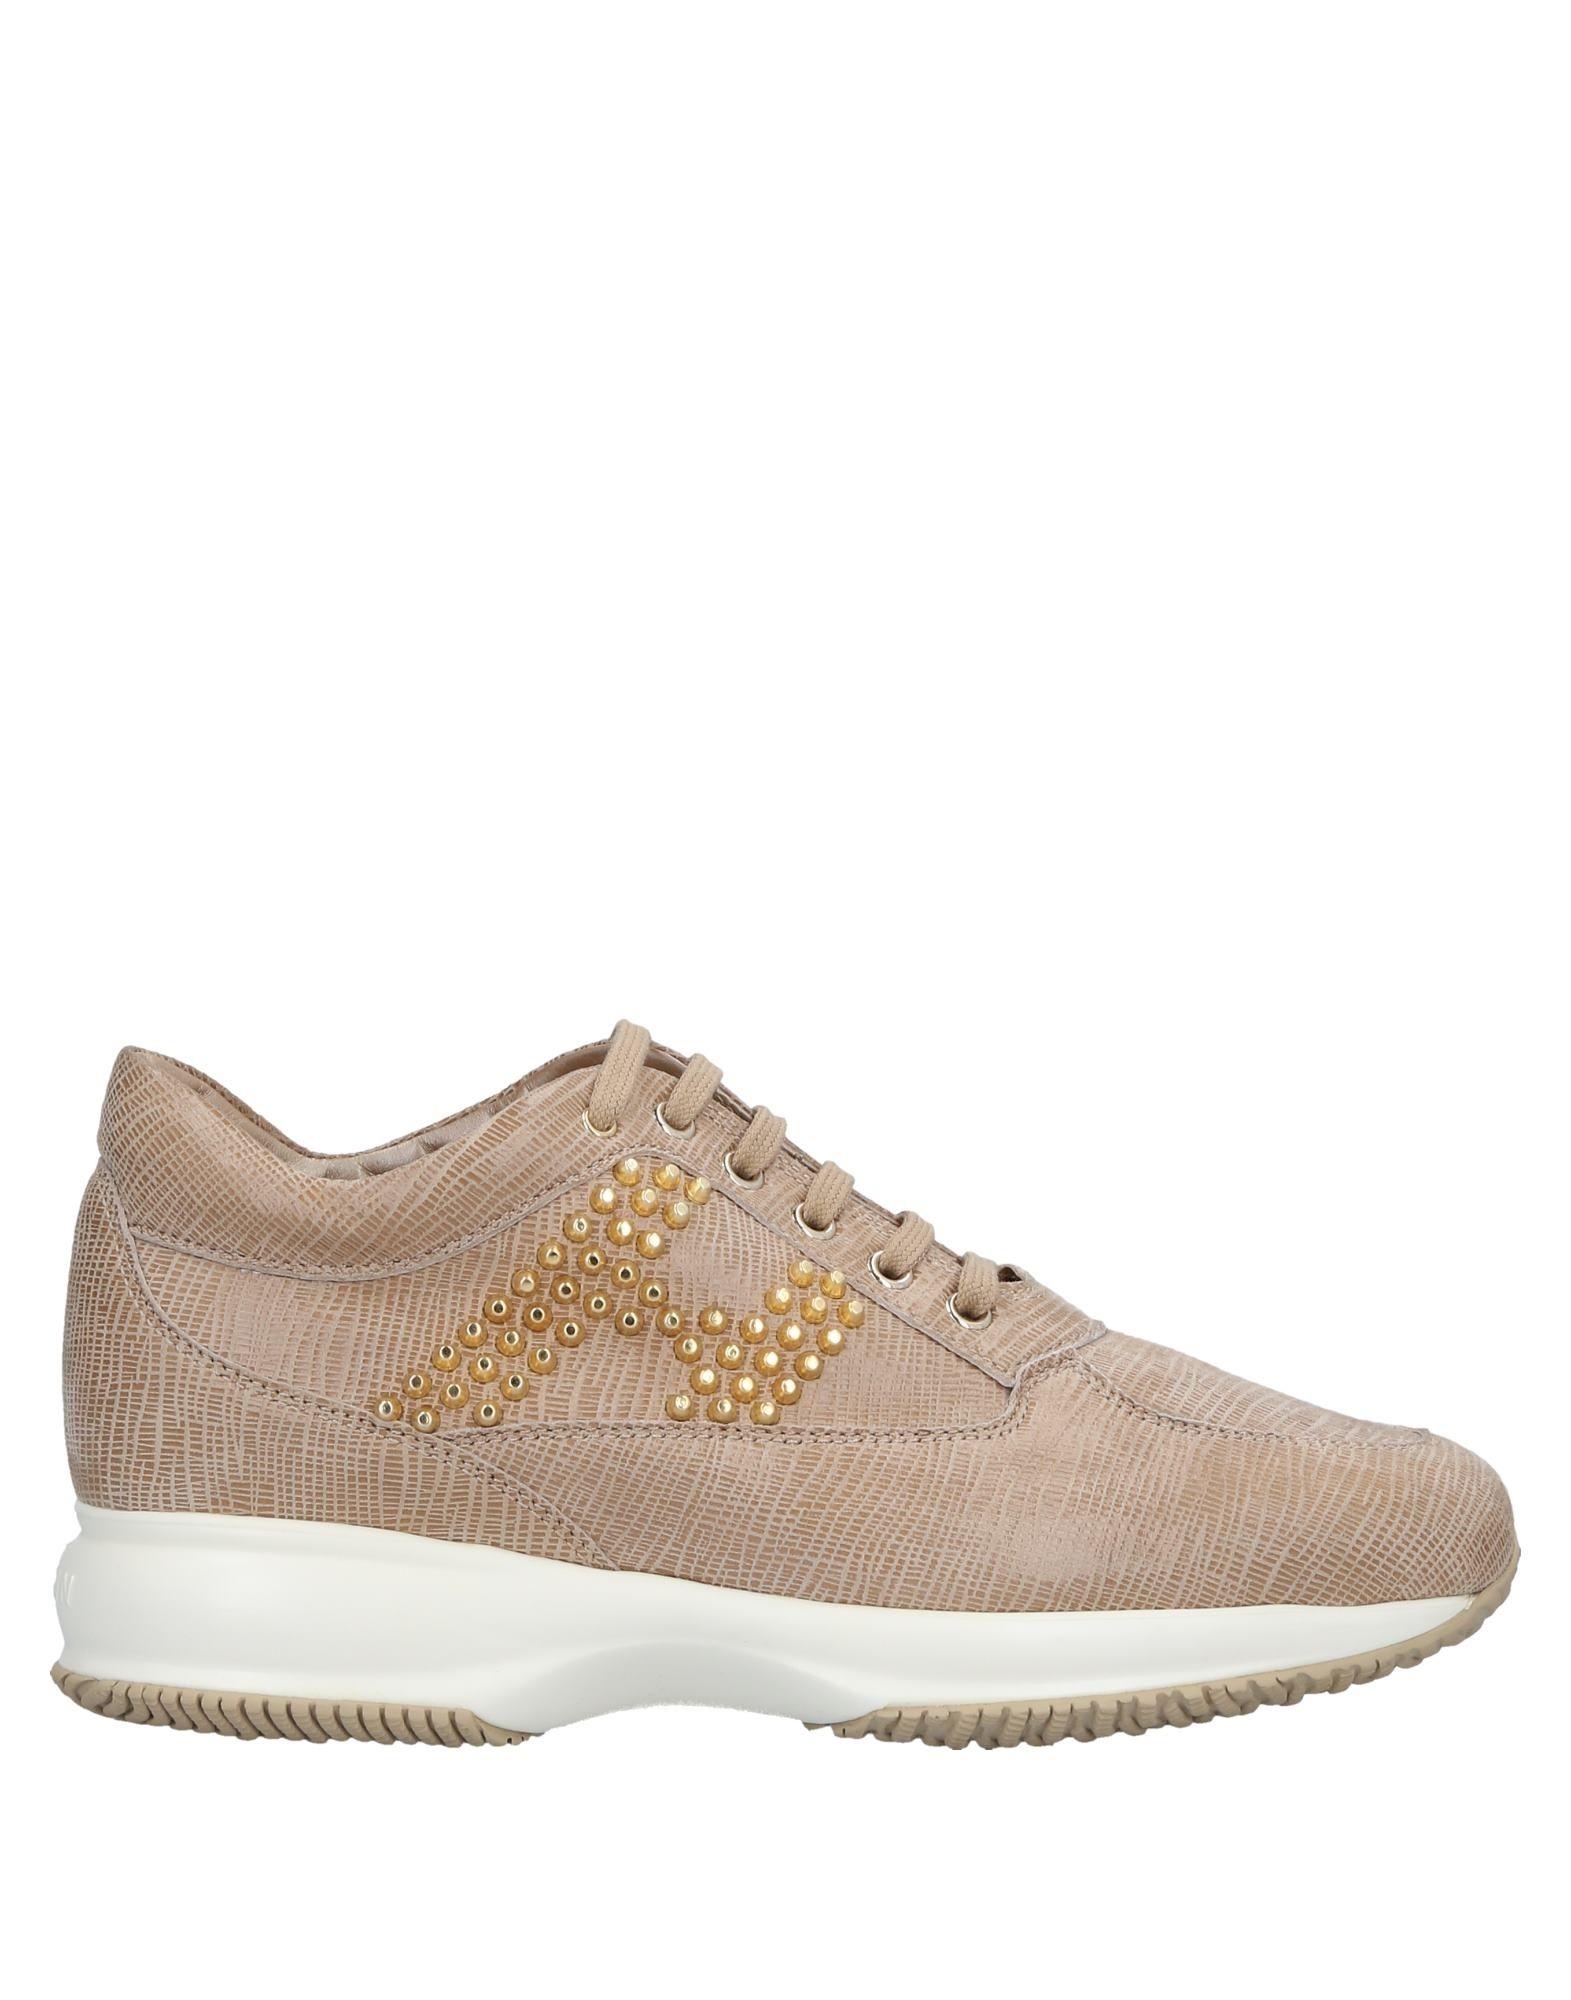 Moda Sneakers Hogan Donna - 11537944JH